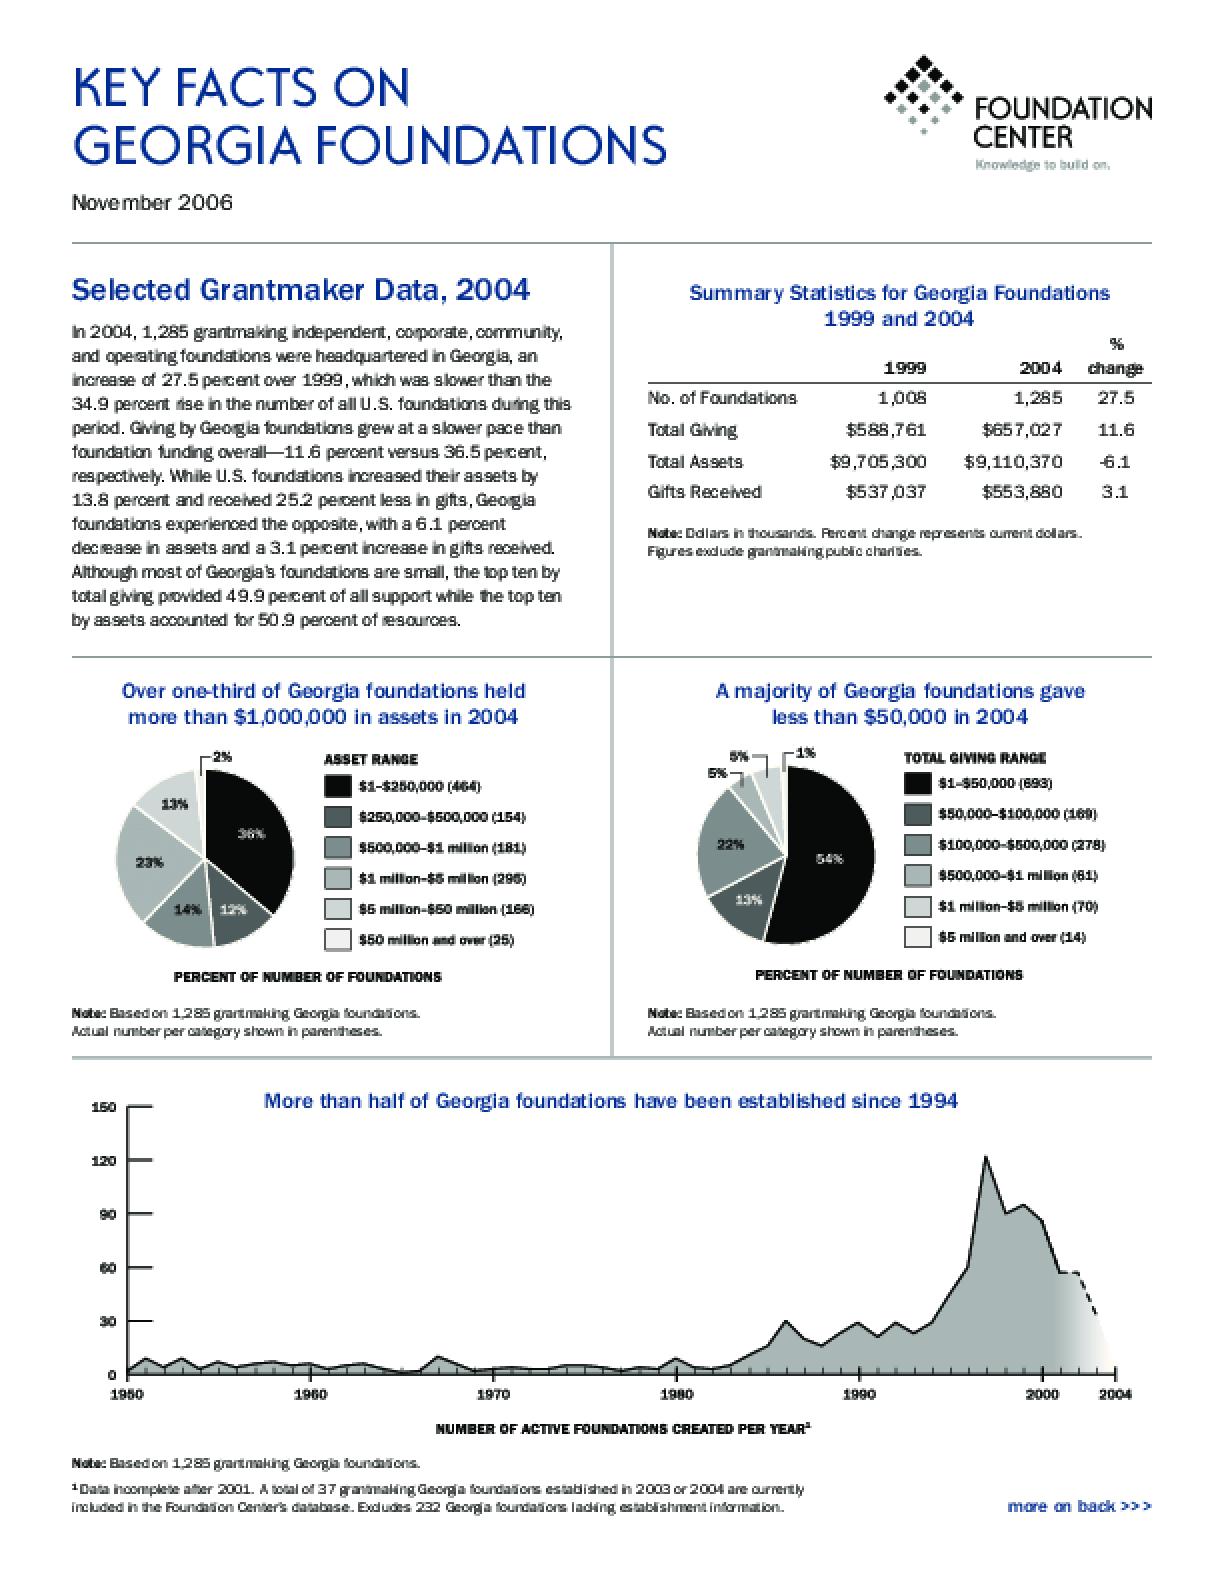 Key Facts on Georgia Foundations, 2006